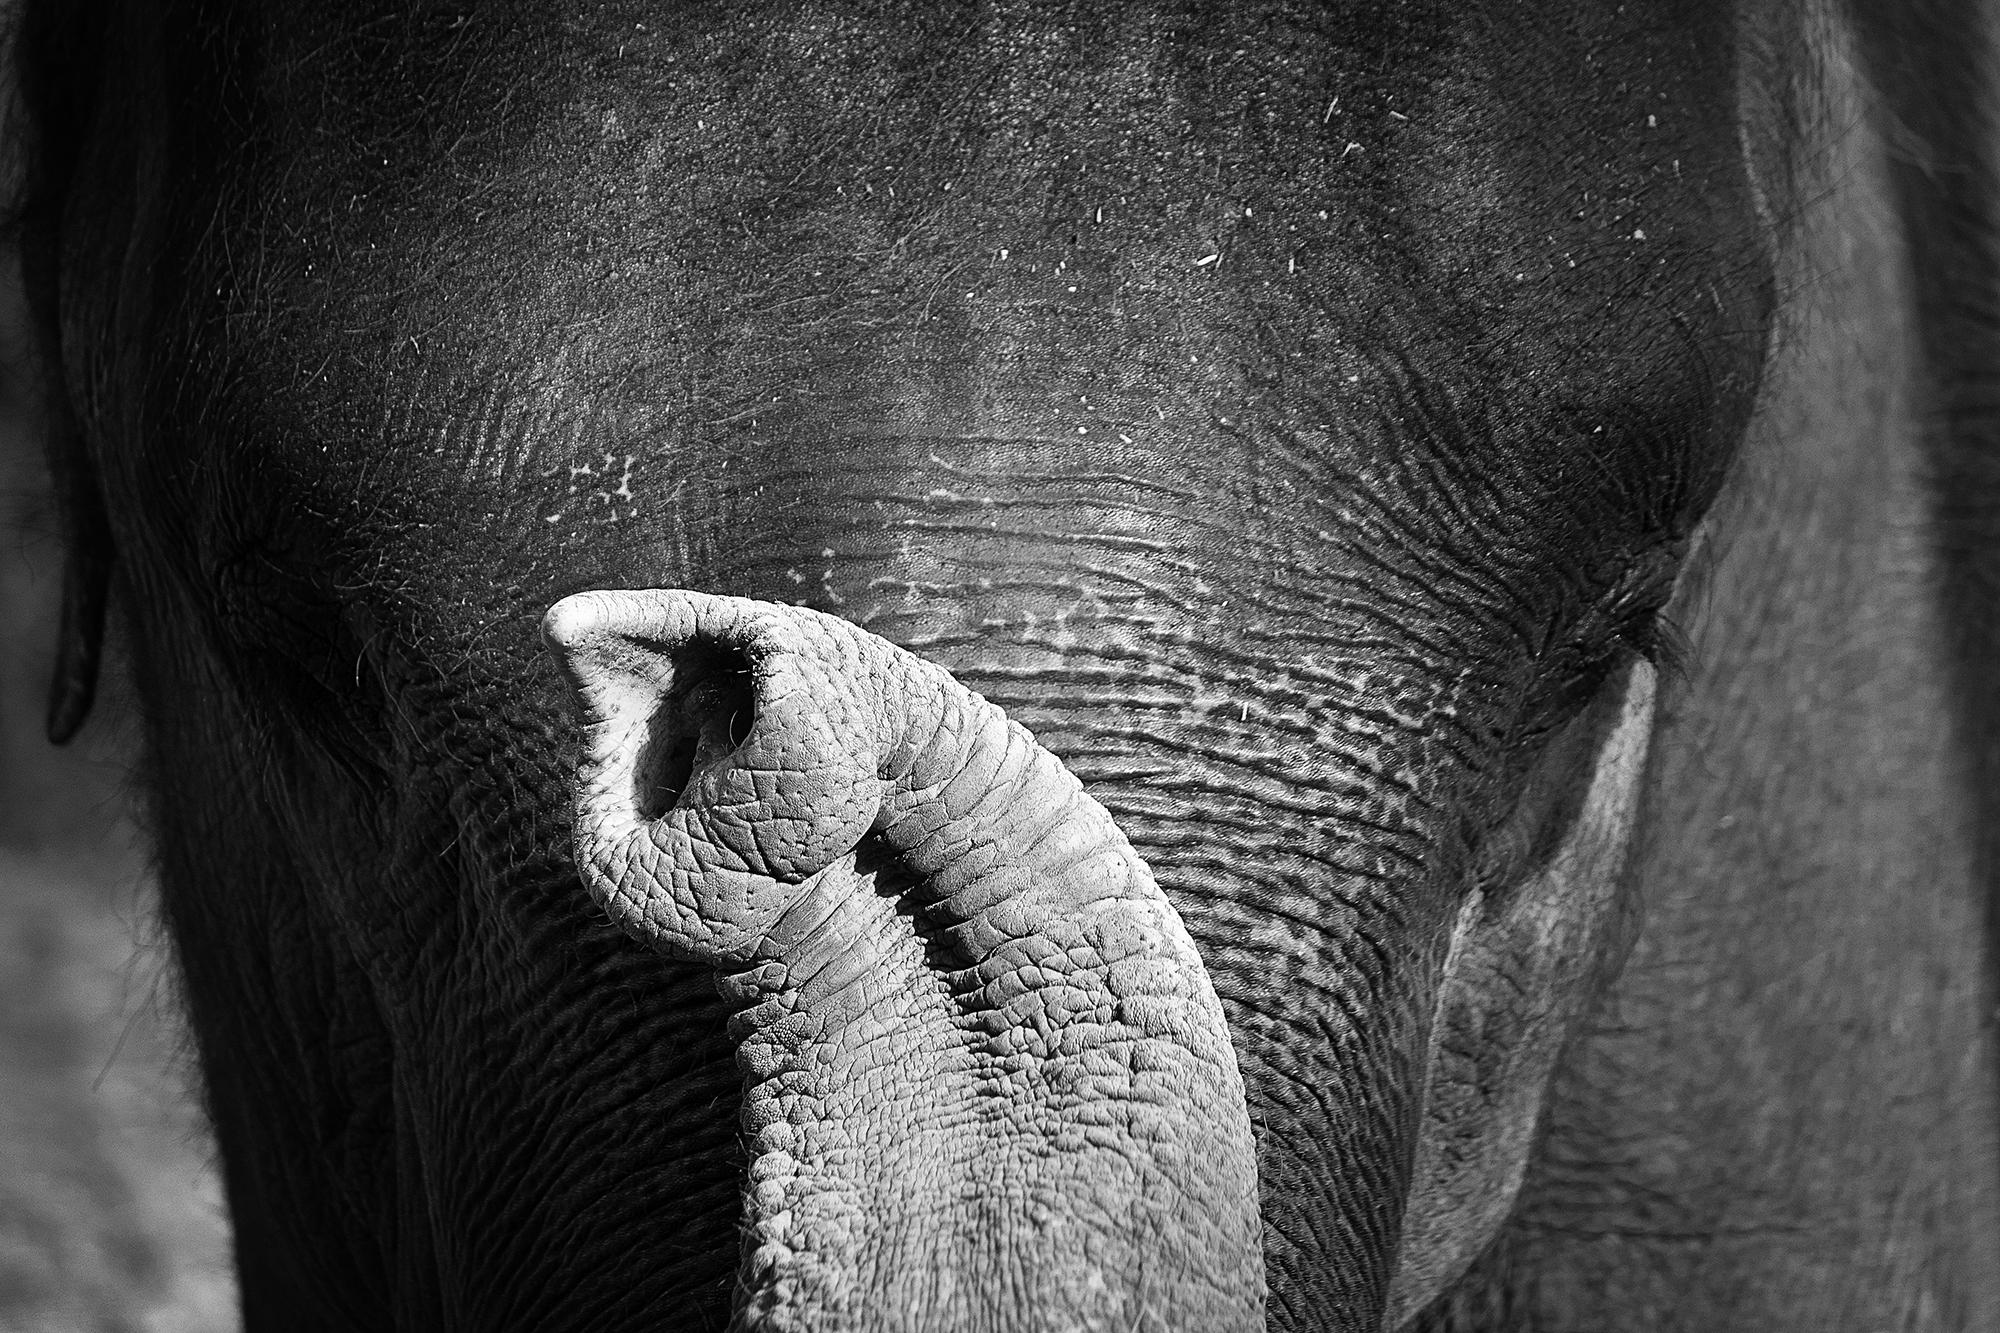 Elephant's Namashkar